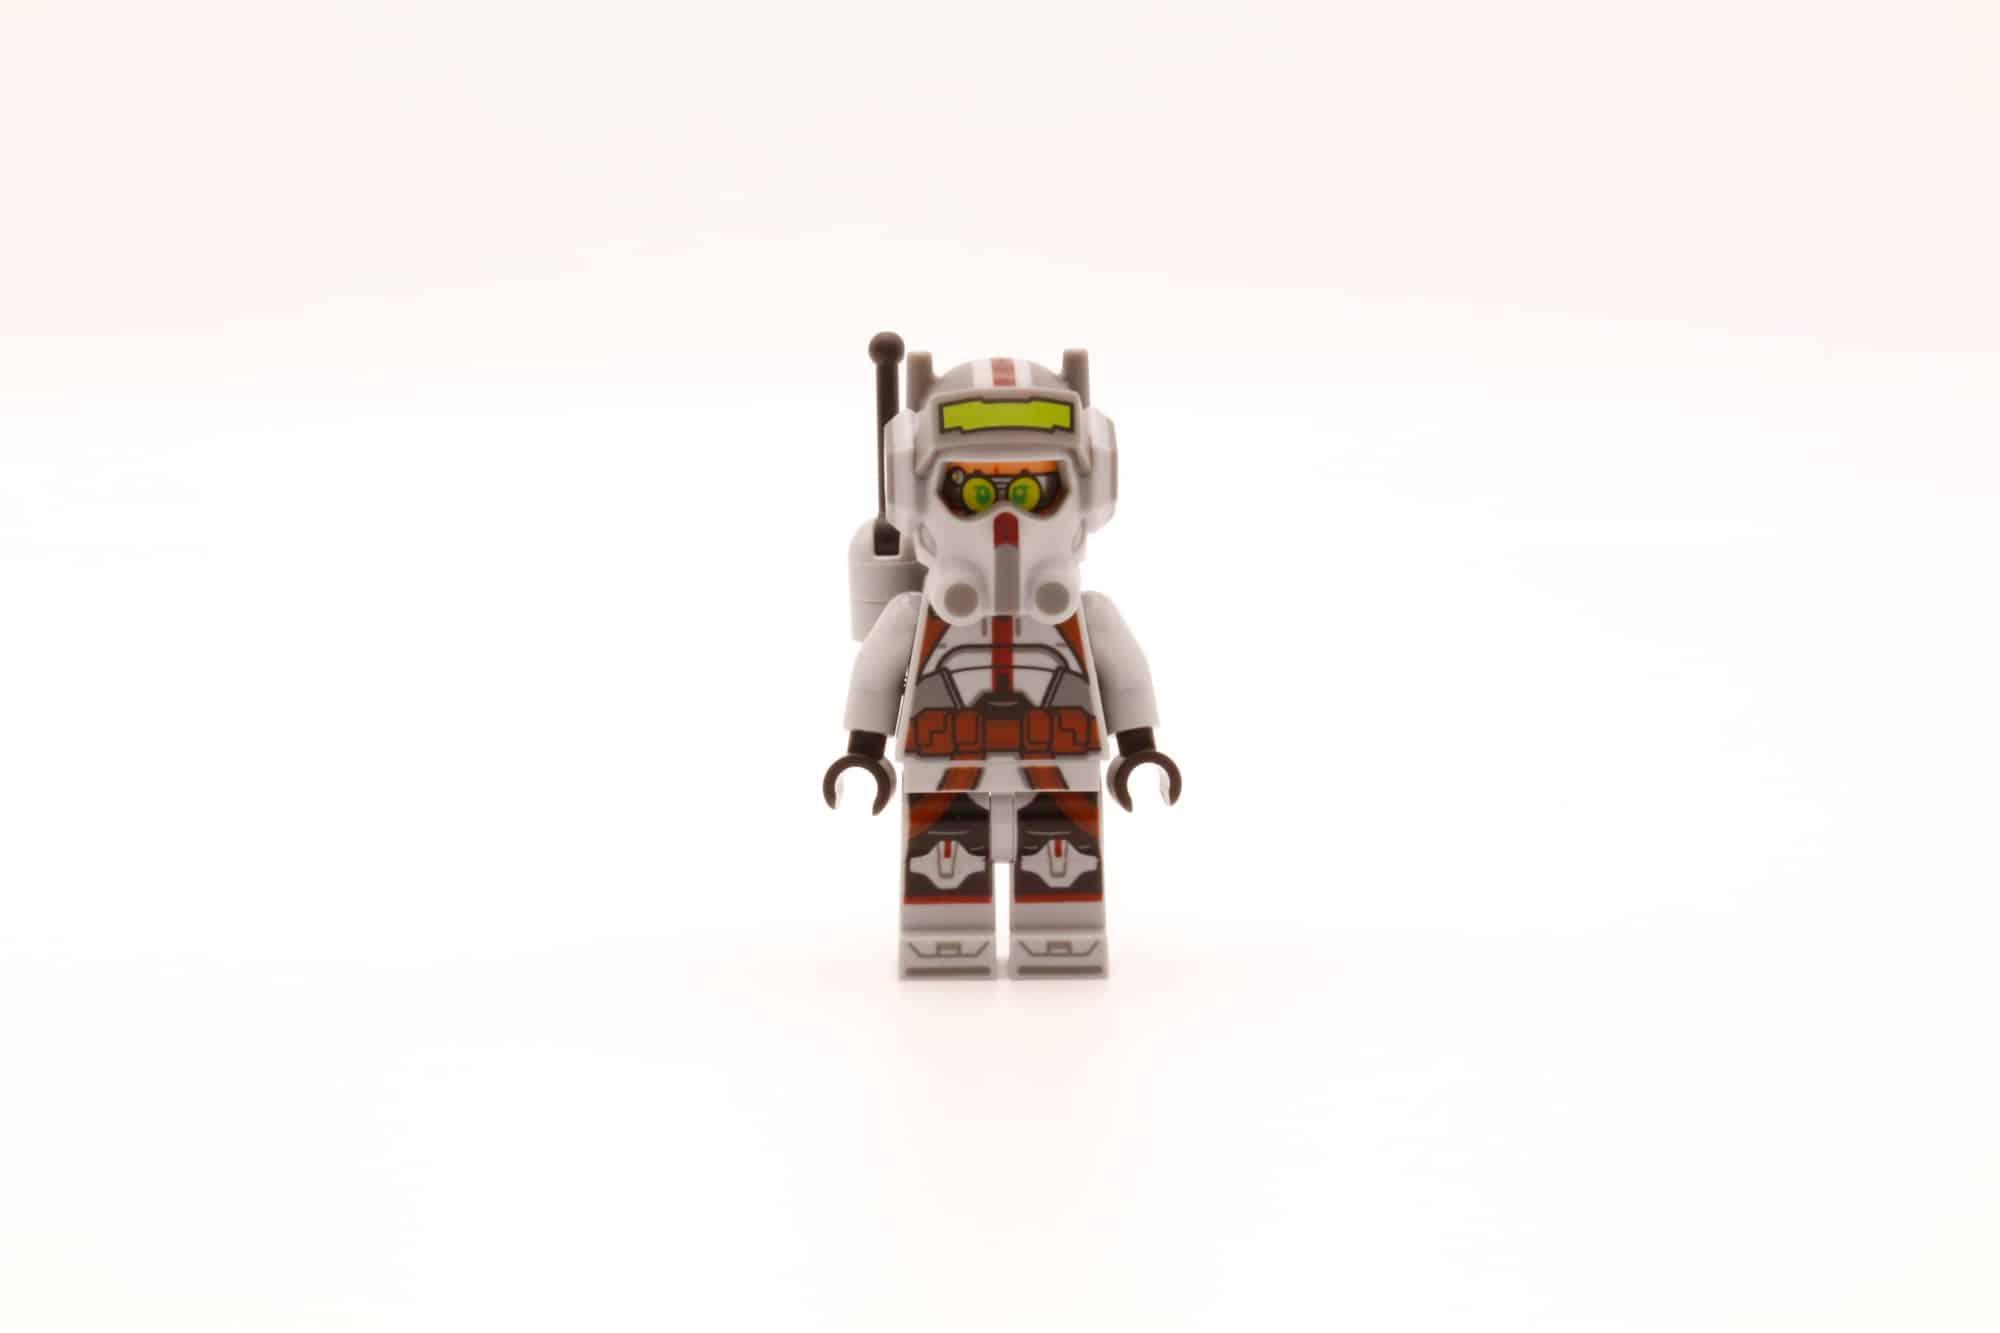 LEGO Star Wars 75314 The Bad Batch Attack Shuttle Tech Helm